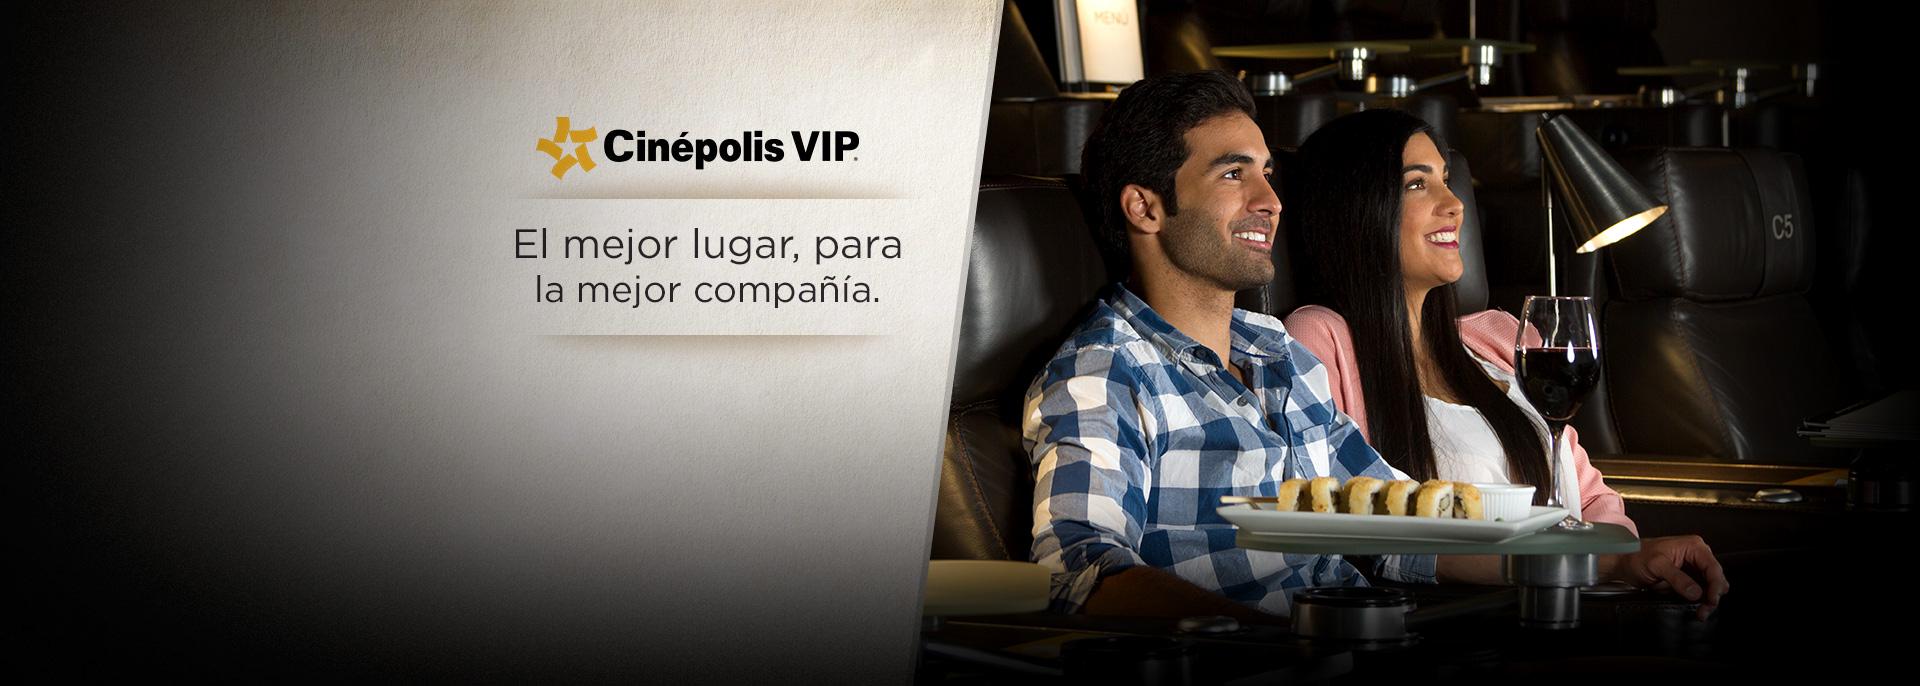 Cinépolis VIP